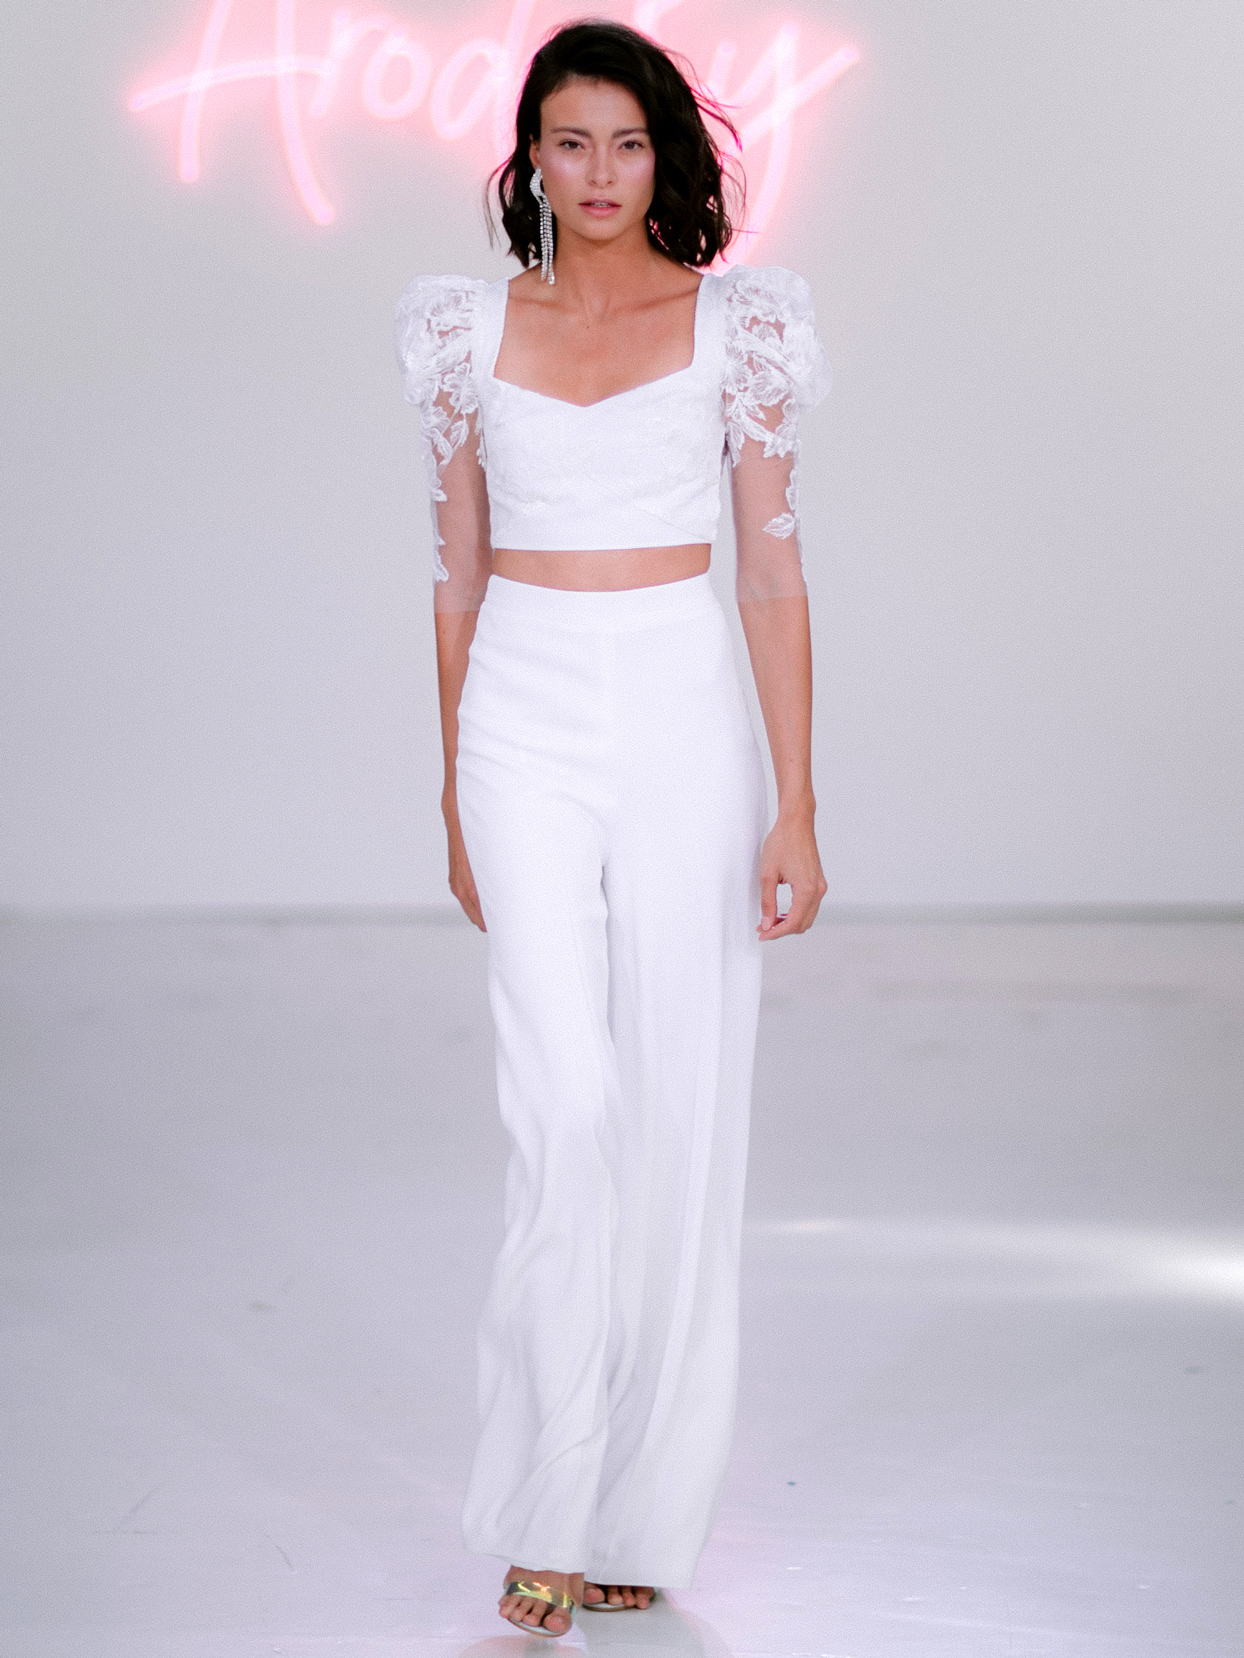 Rime Arodaky X The Mews Bridal two piece square neckline pants wedding dress fall 2020